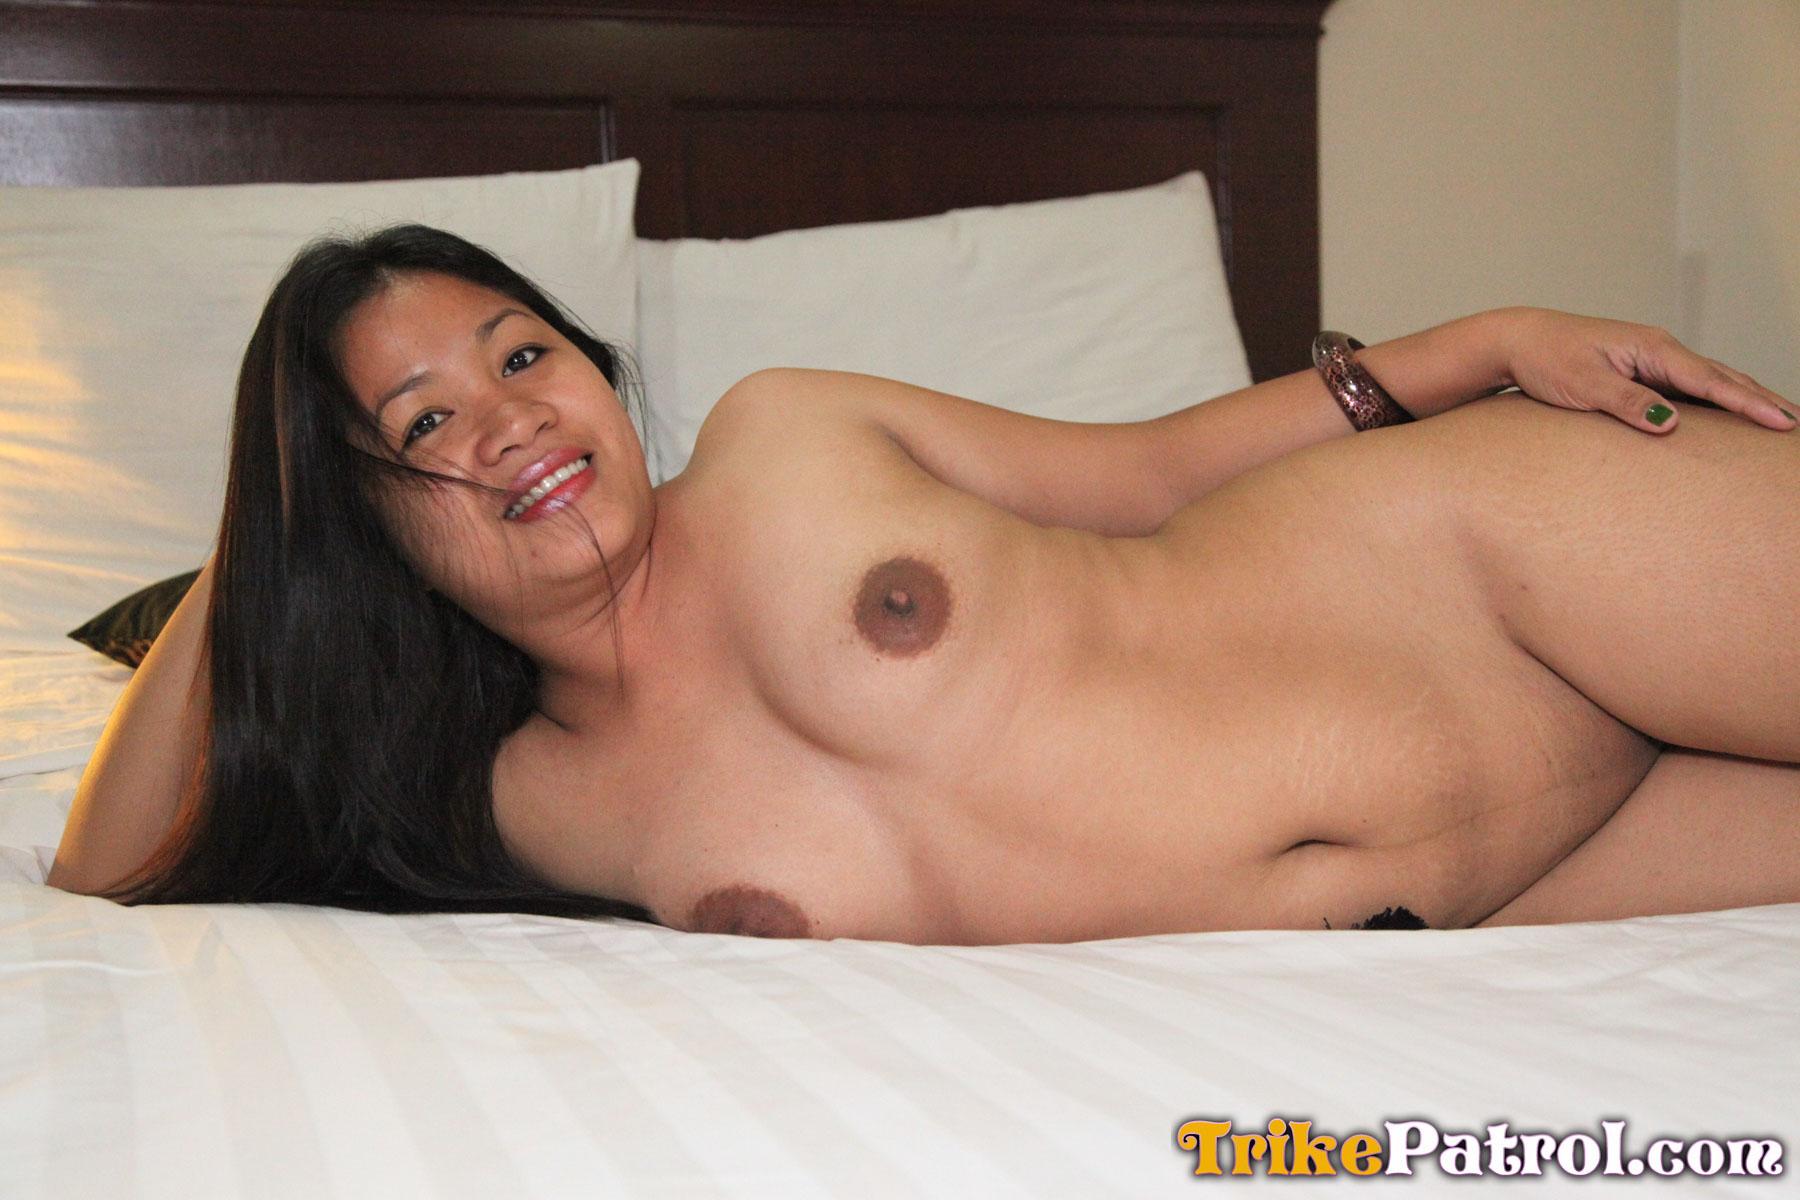 Atl bbw porn